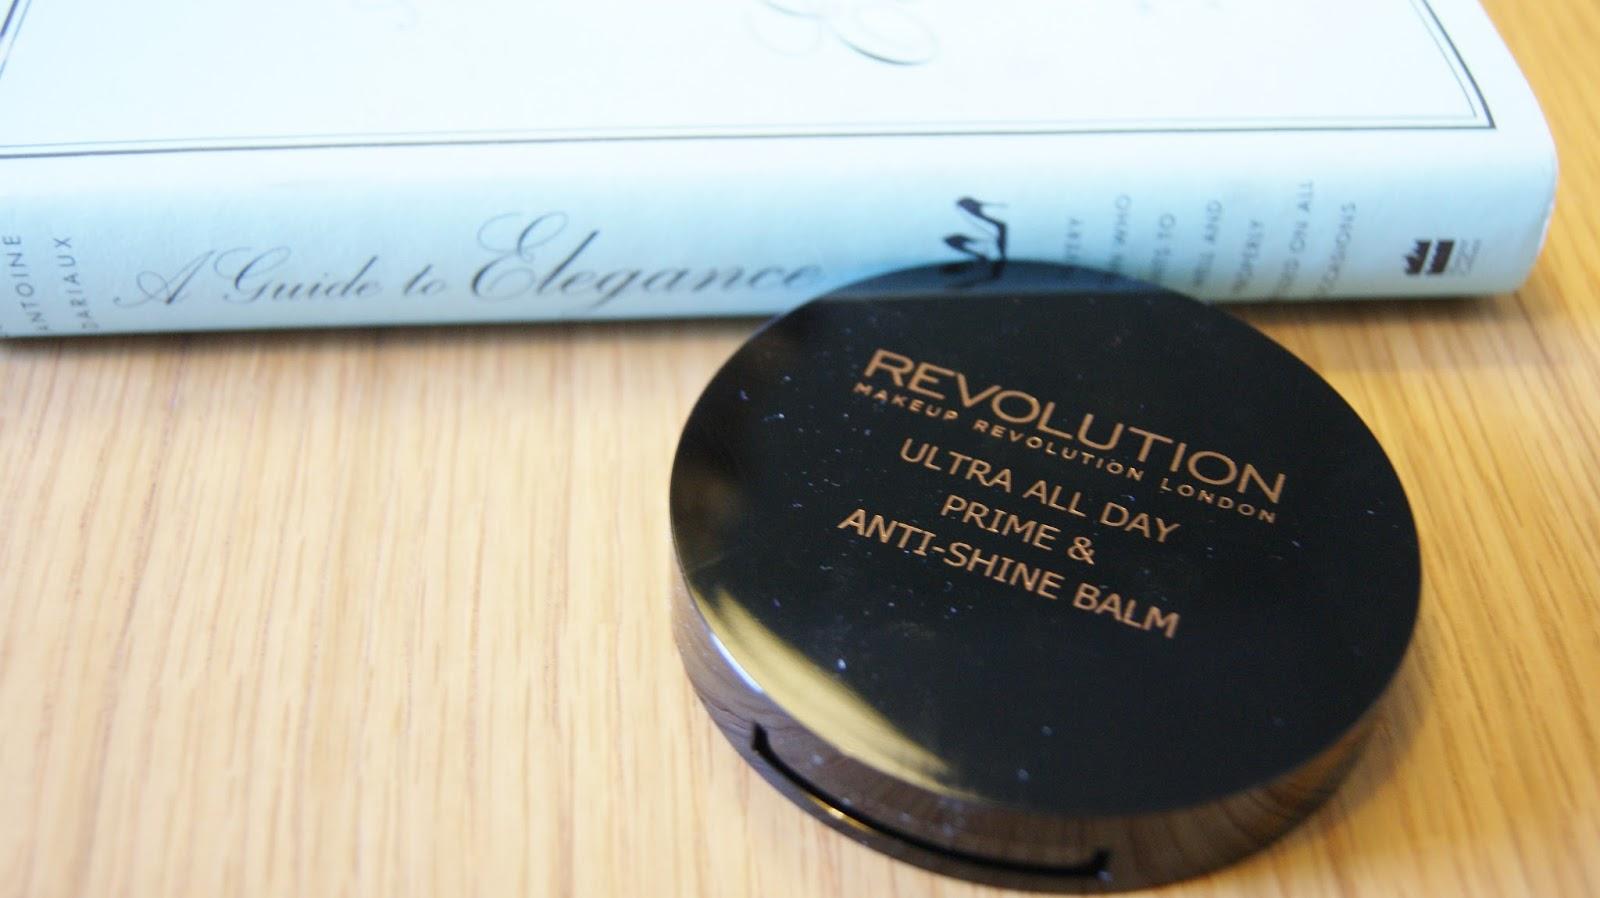 Makeup Revolution All Day Prime & Anti-Shine Balm Pan Compact